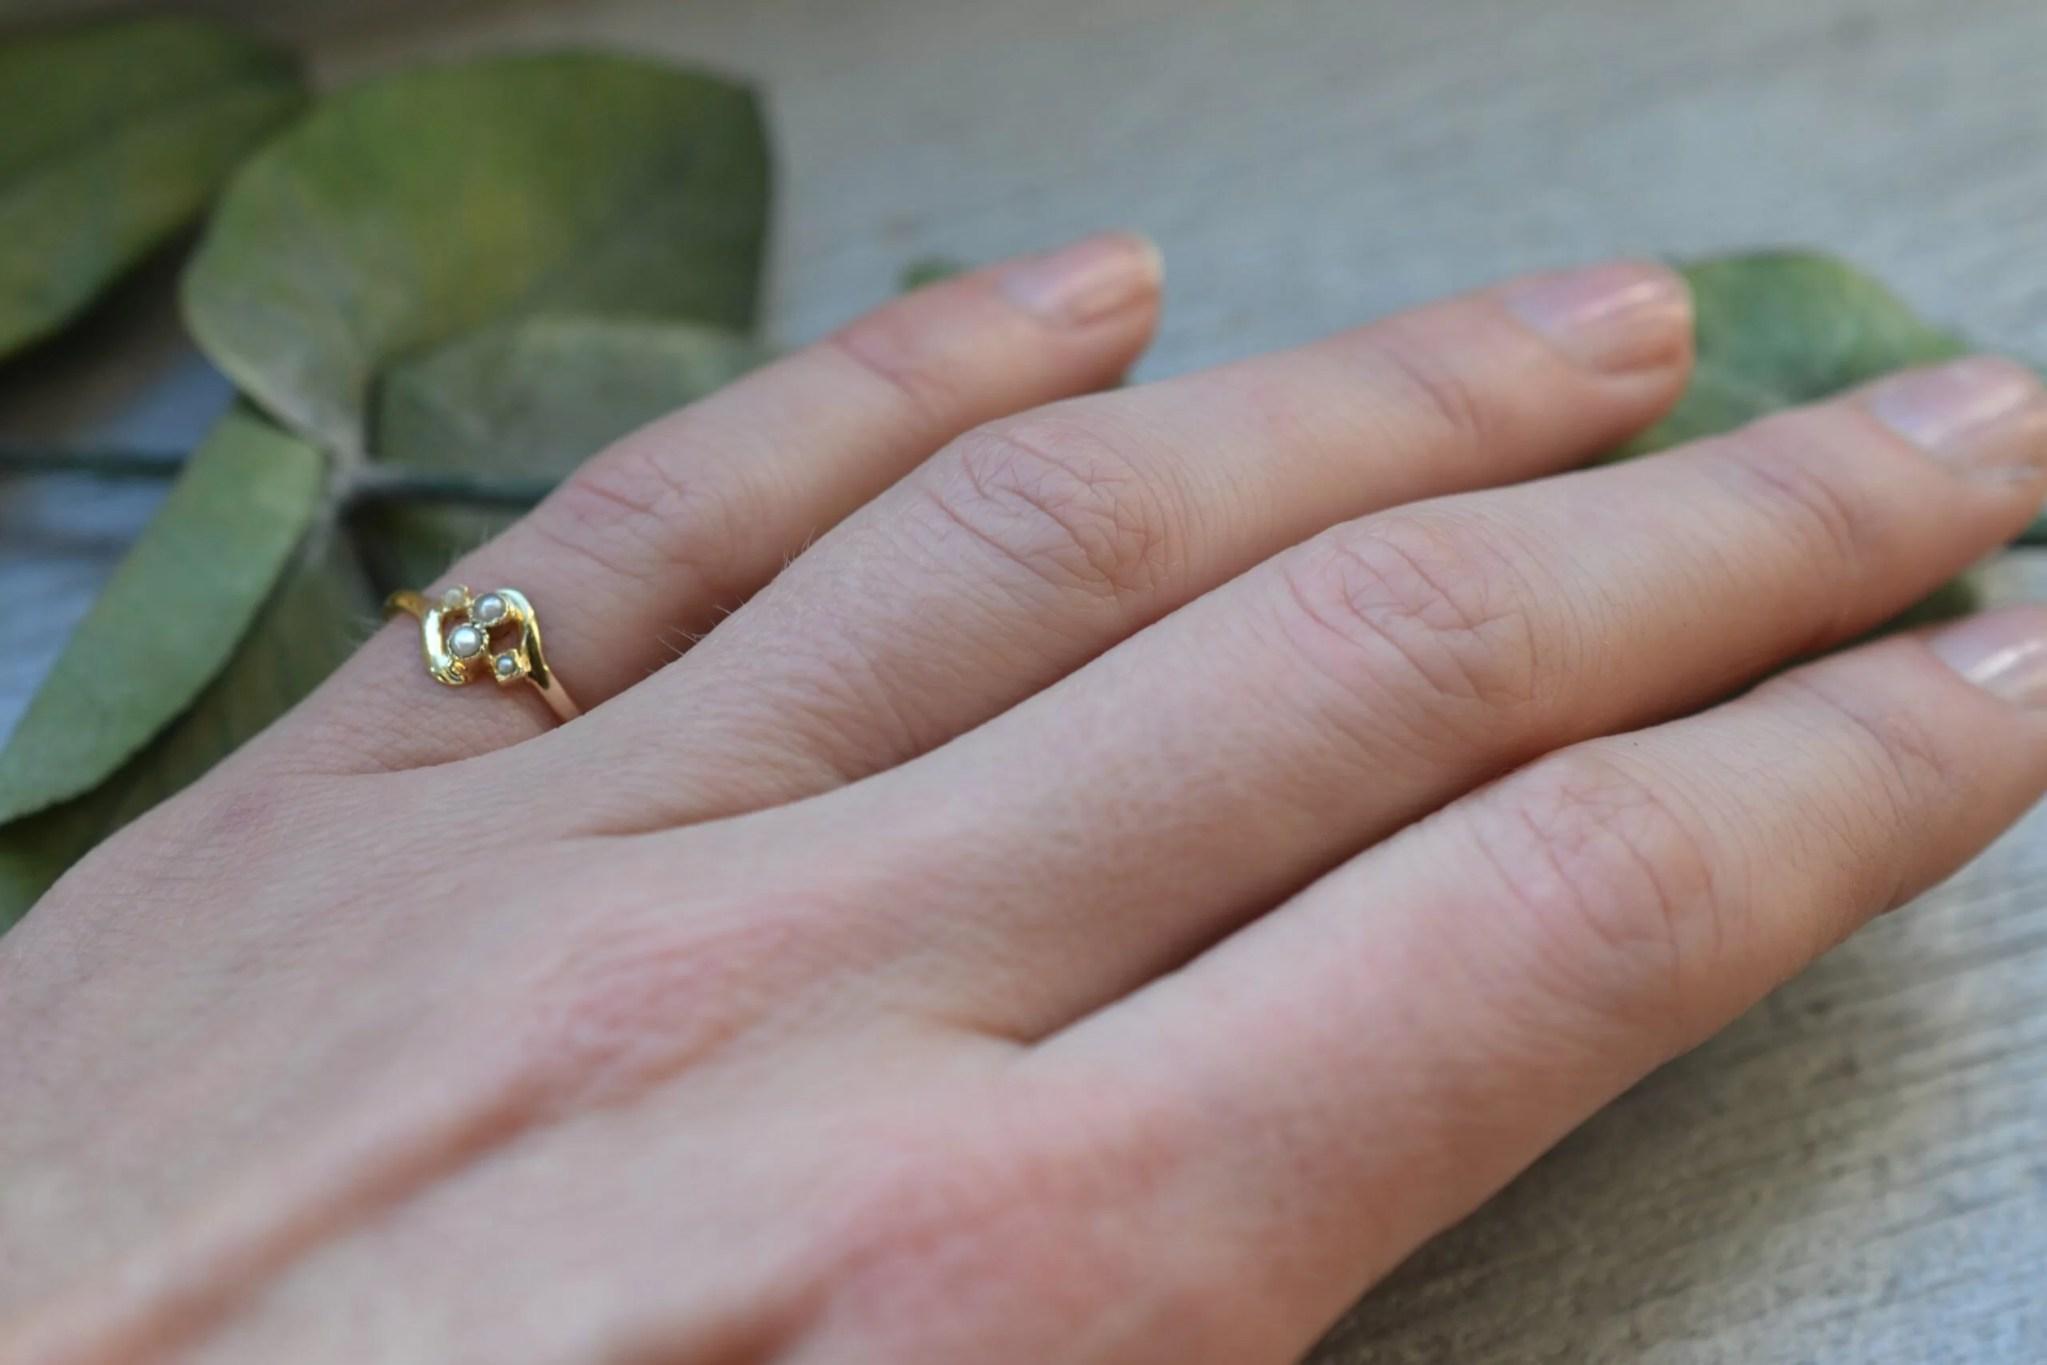 Bague vintage en or jaune massif 18 carats (750/1000), sertie de demi-perles